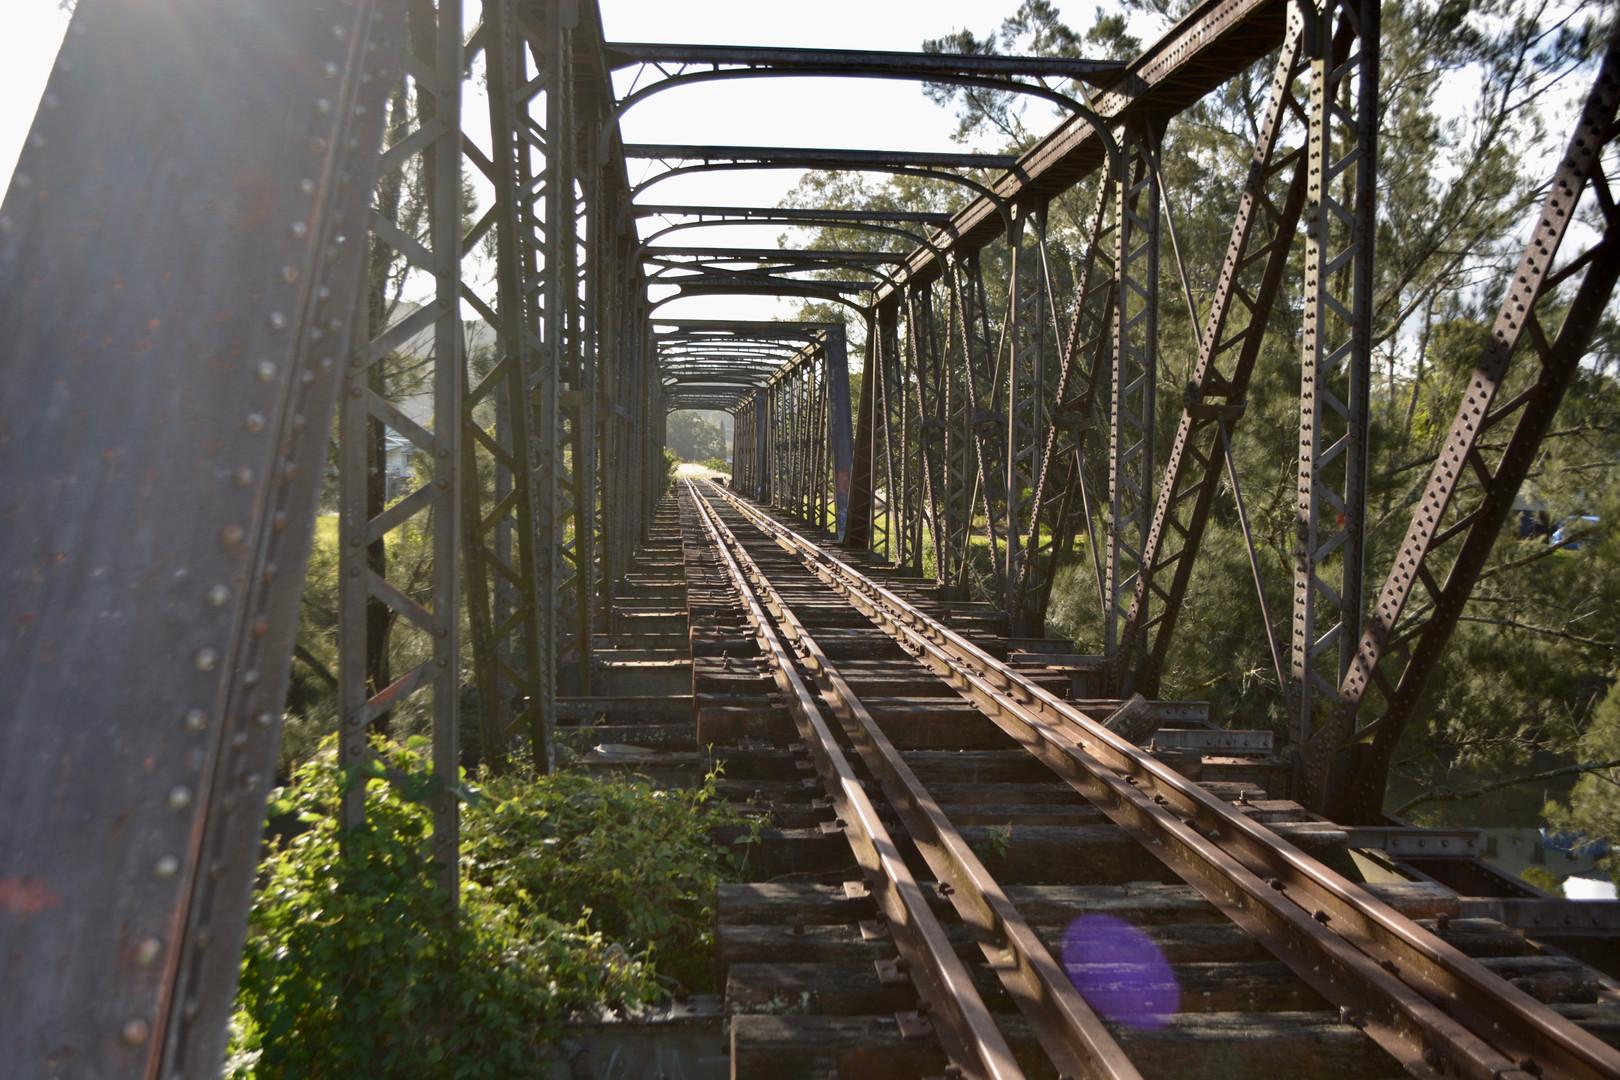 Railway tracks photo credit Naomi Fryer